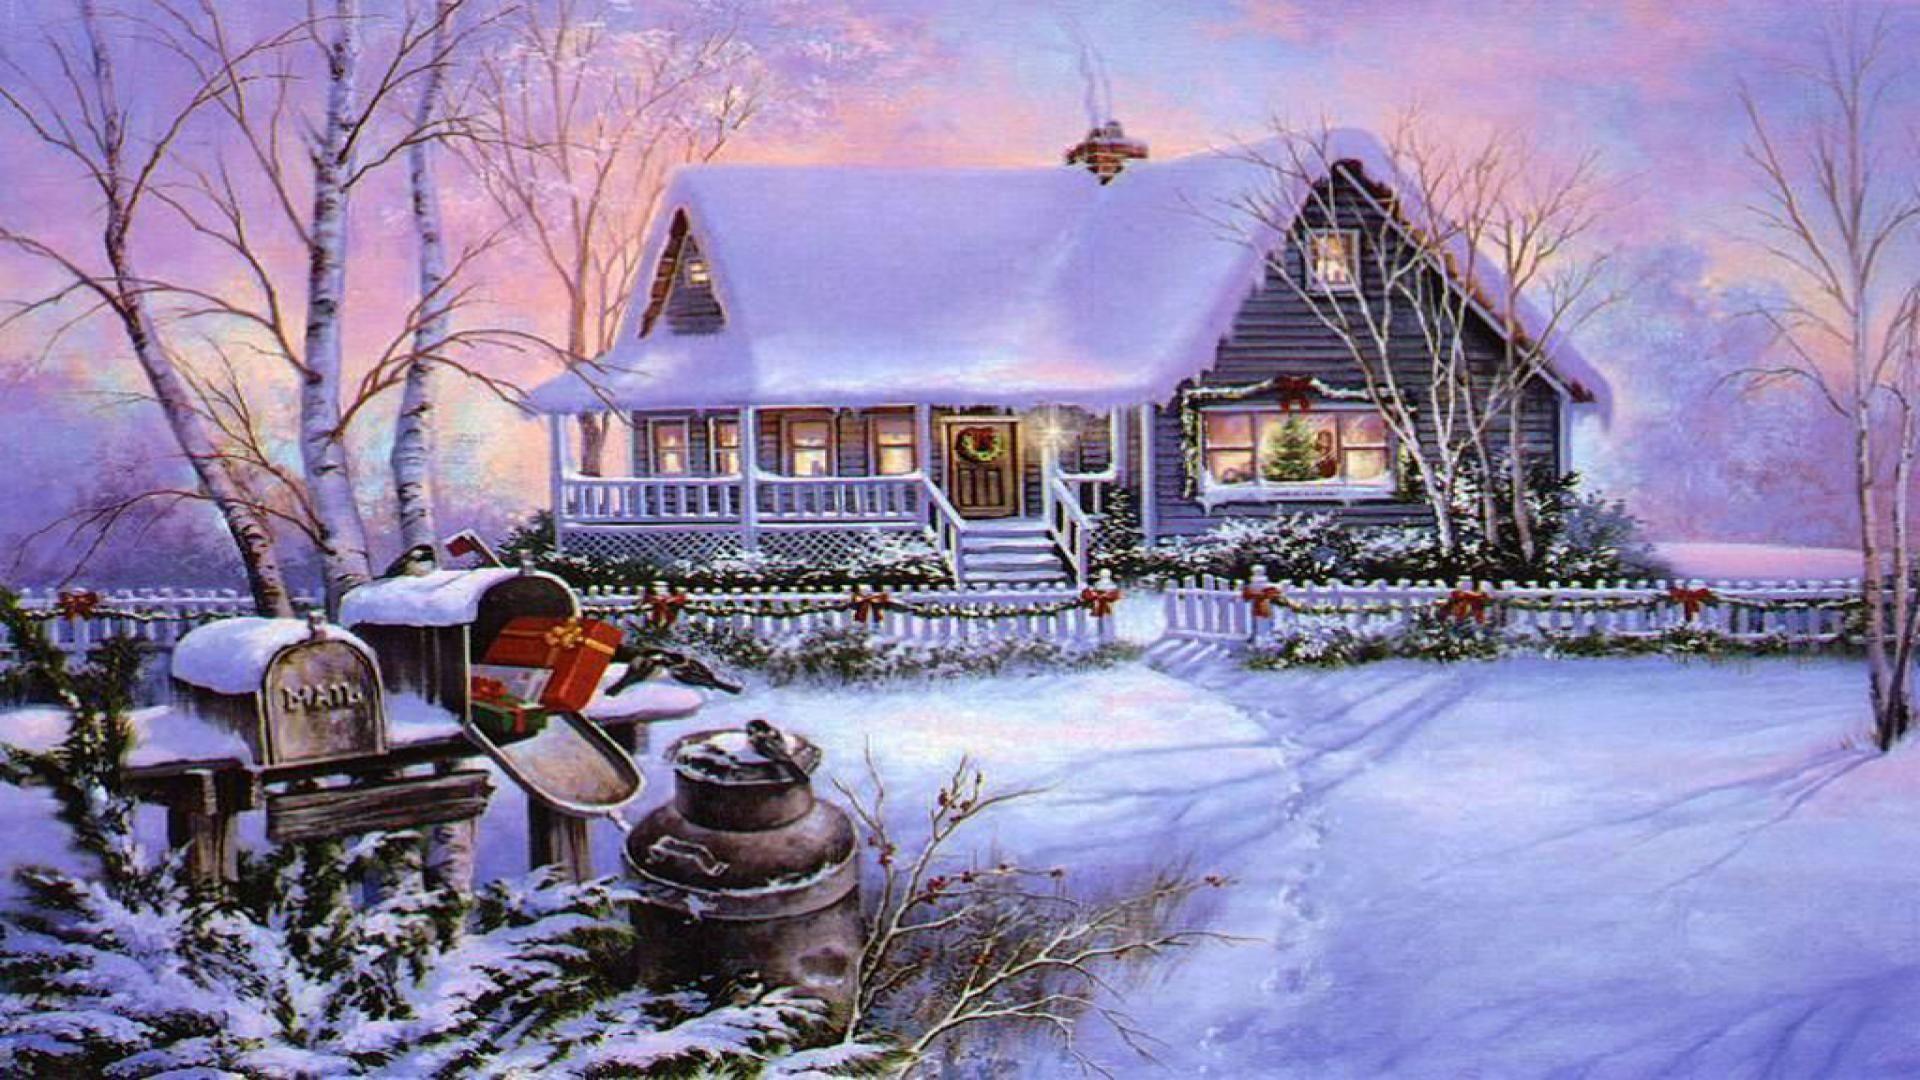 Christmas Winter Scenes Download HD Weihnachtshaus